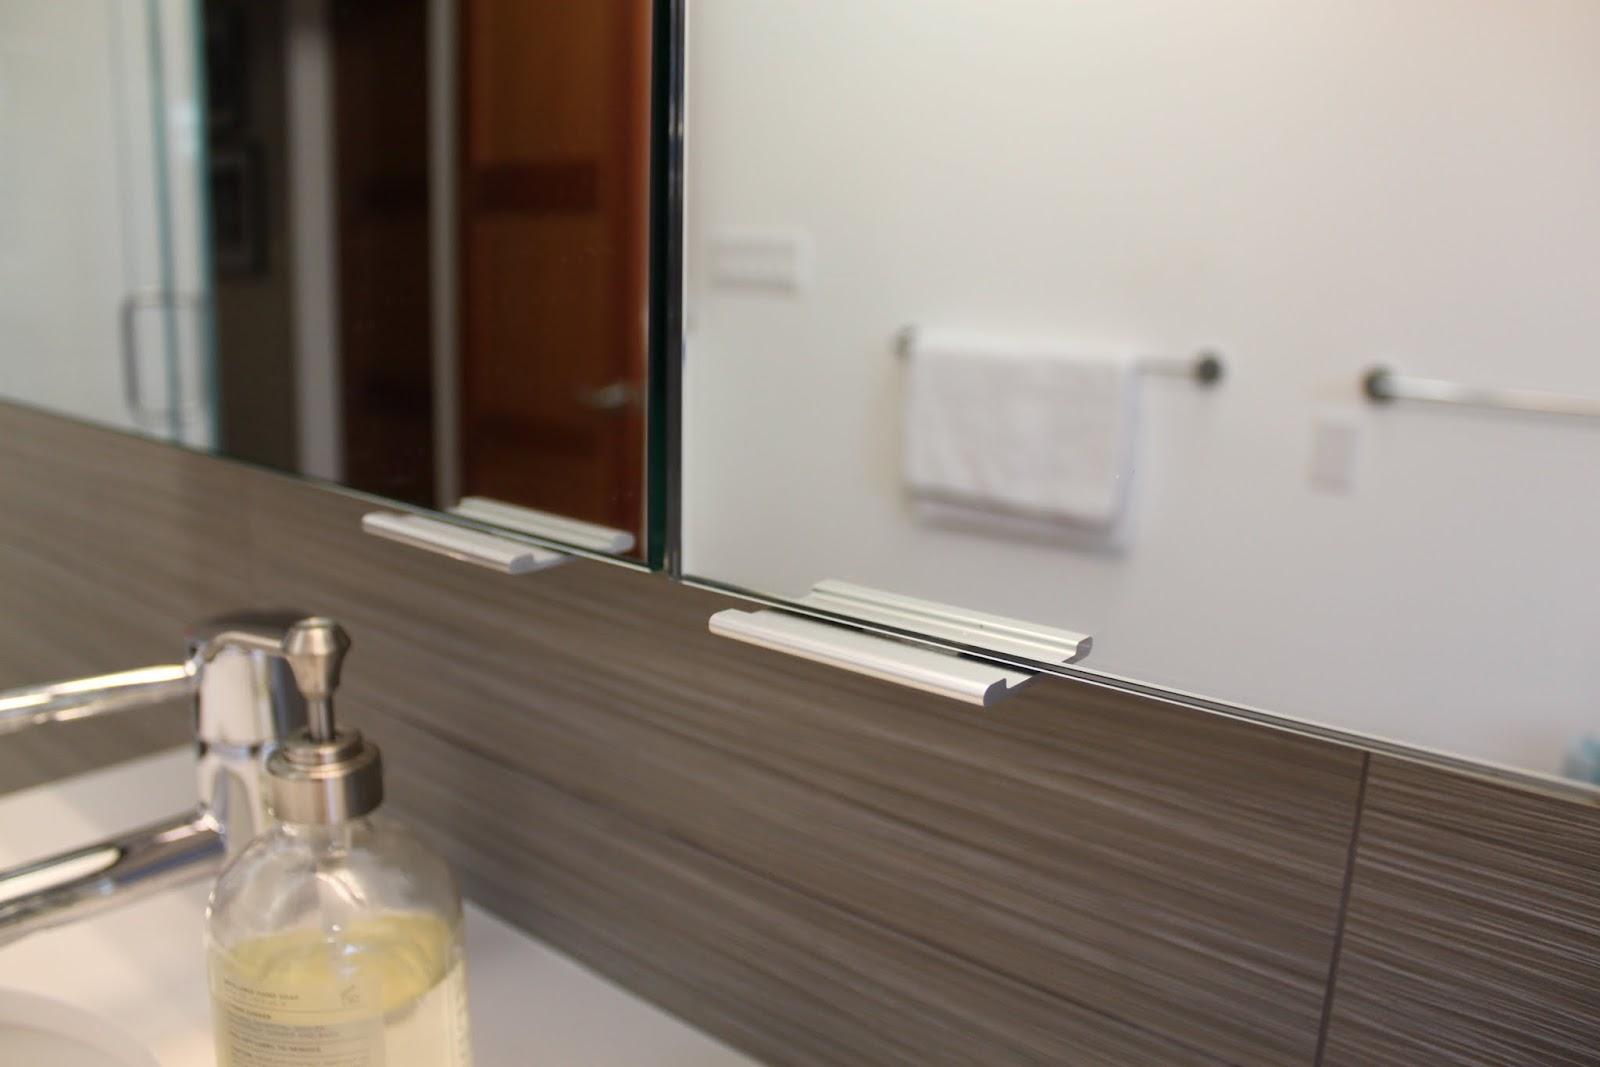 Elegant Door Hardware Cabinet Hardware Bath Hardware Fire And Burglary Safes